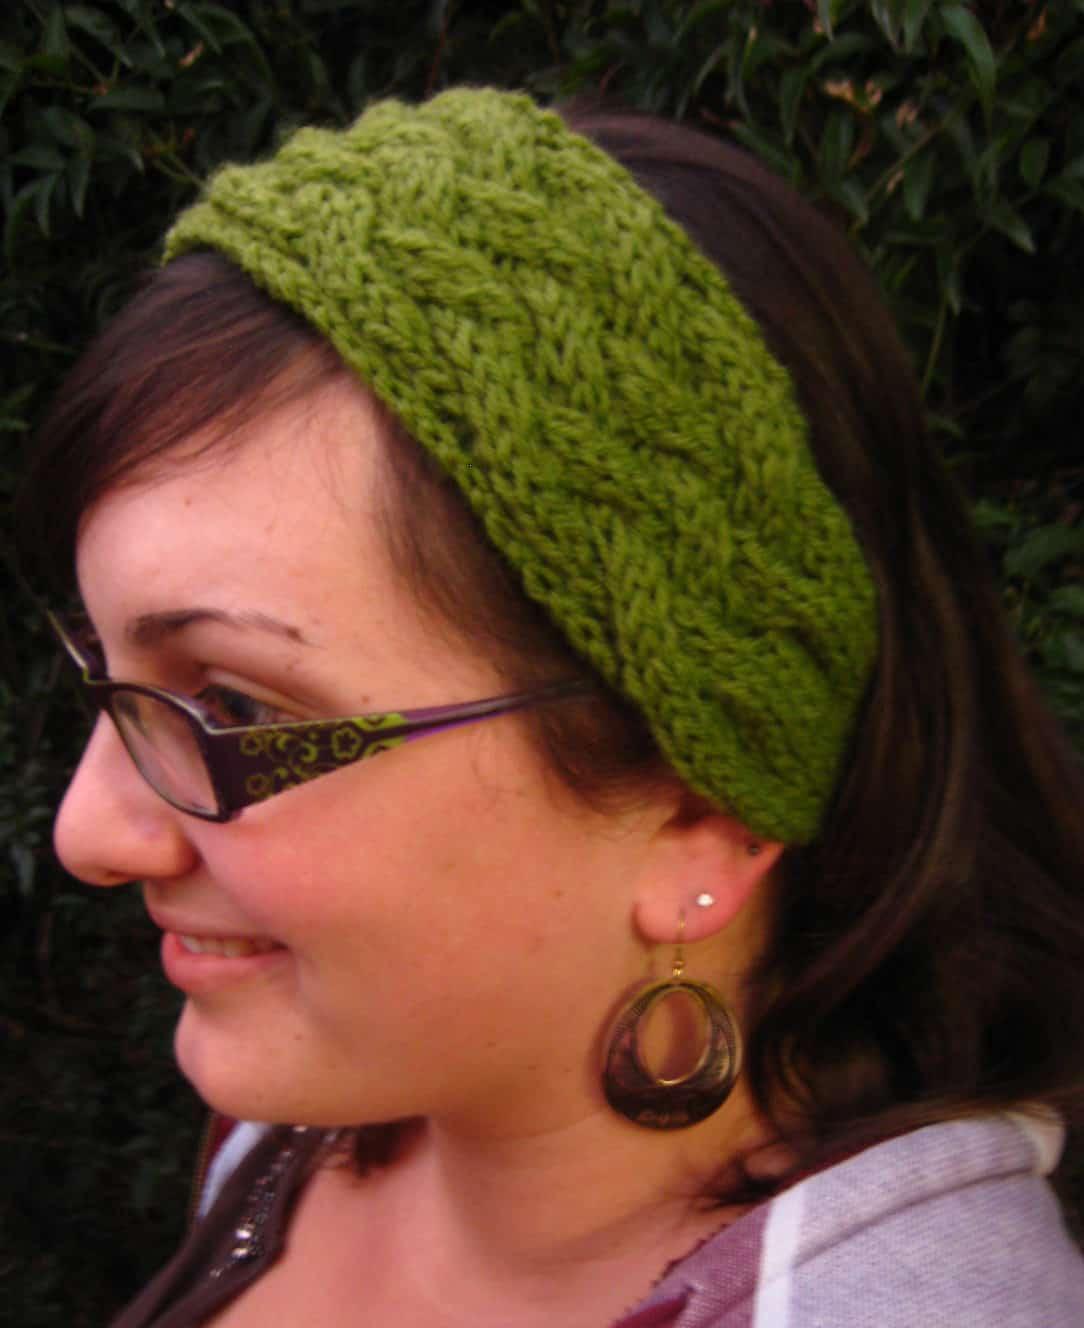 Criss Cross Cable headband